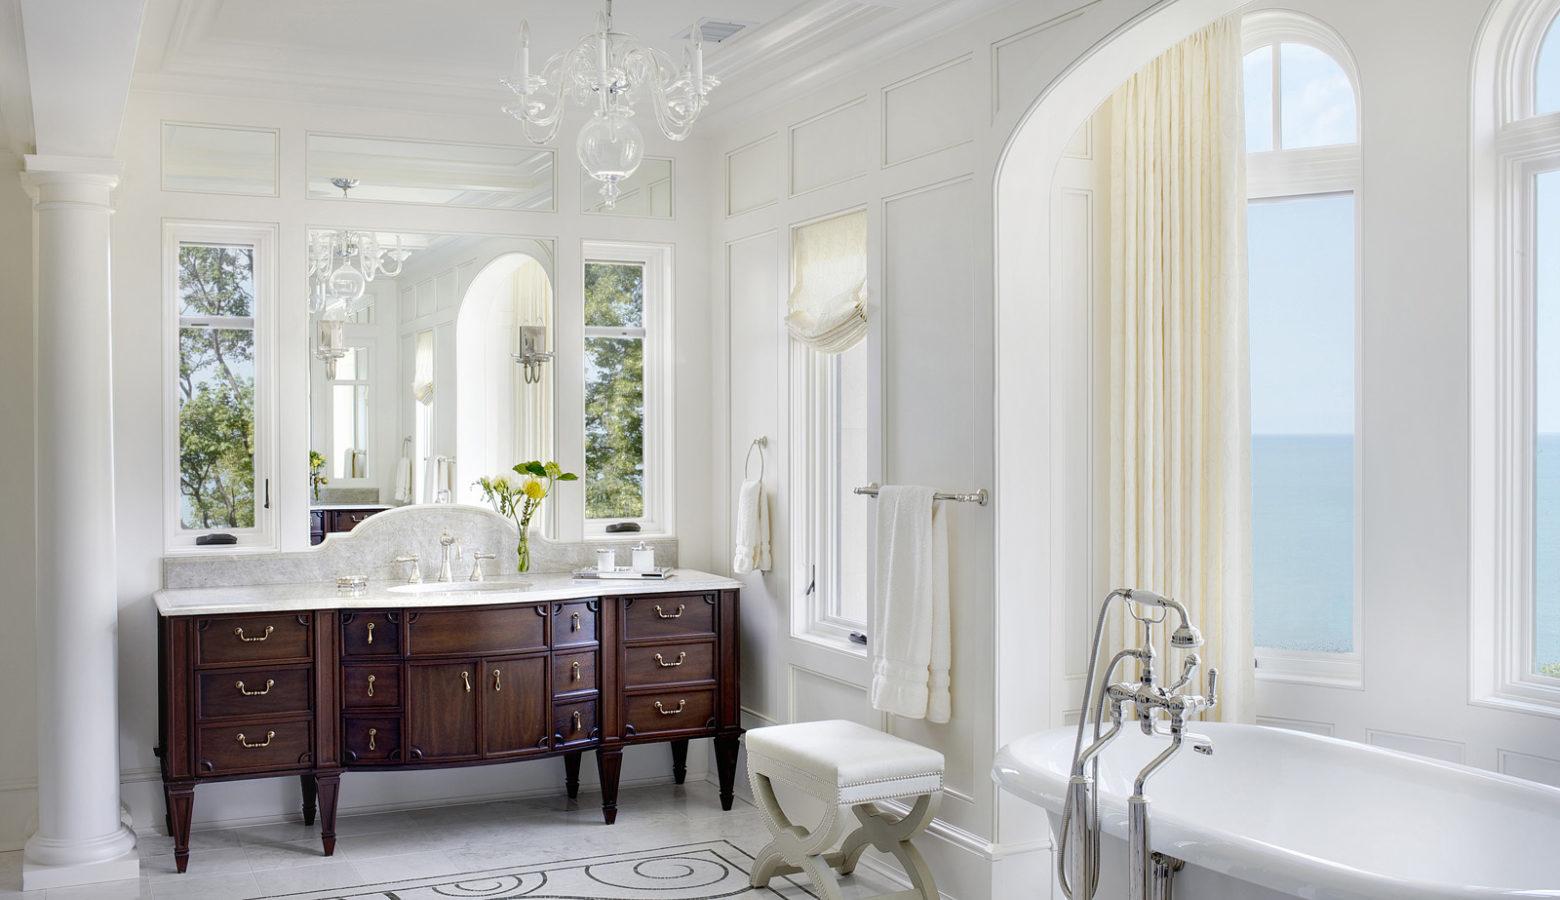 Morgante Wilson | Trends in Residential Architecture Design: The Spa ...